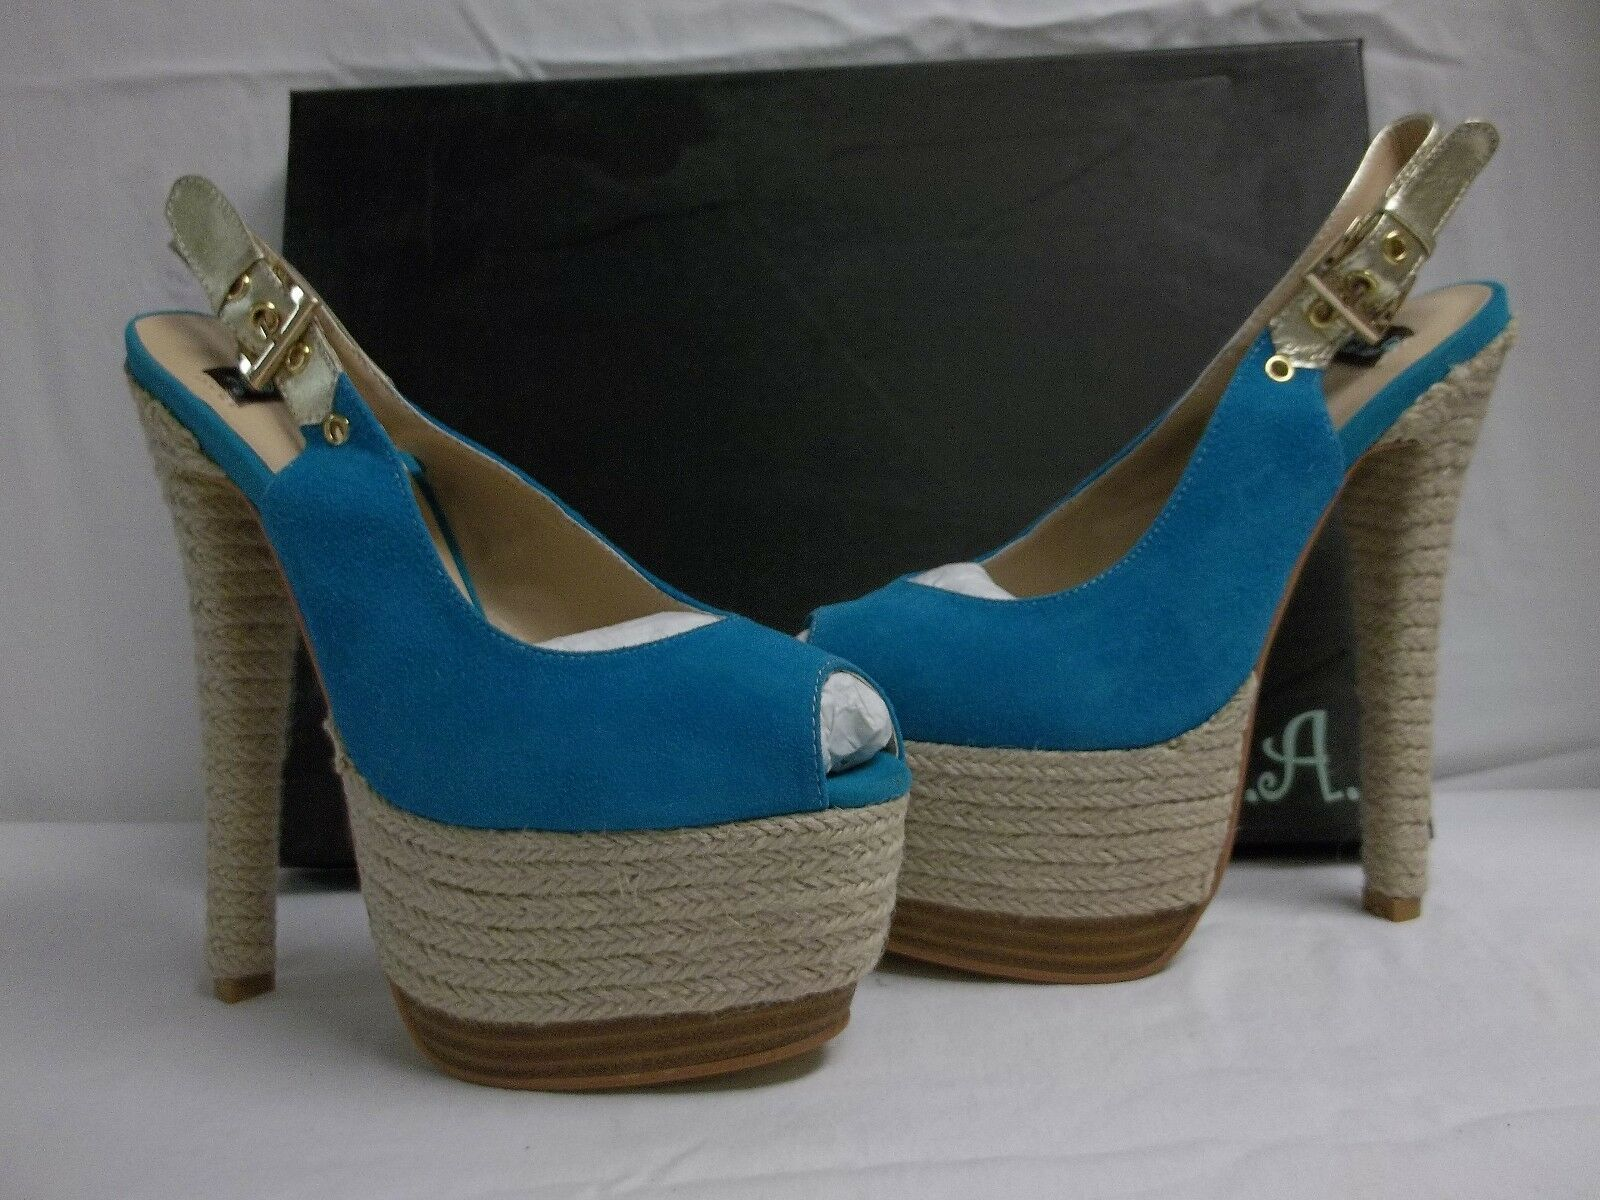 N.Y.L.A. Größe 7.5 M Pearlia Blau Suede Slingbacks Heels New New New damen schuhe d83d19